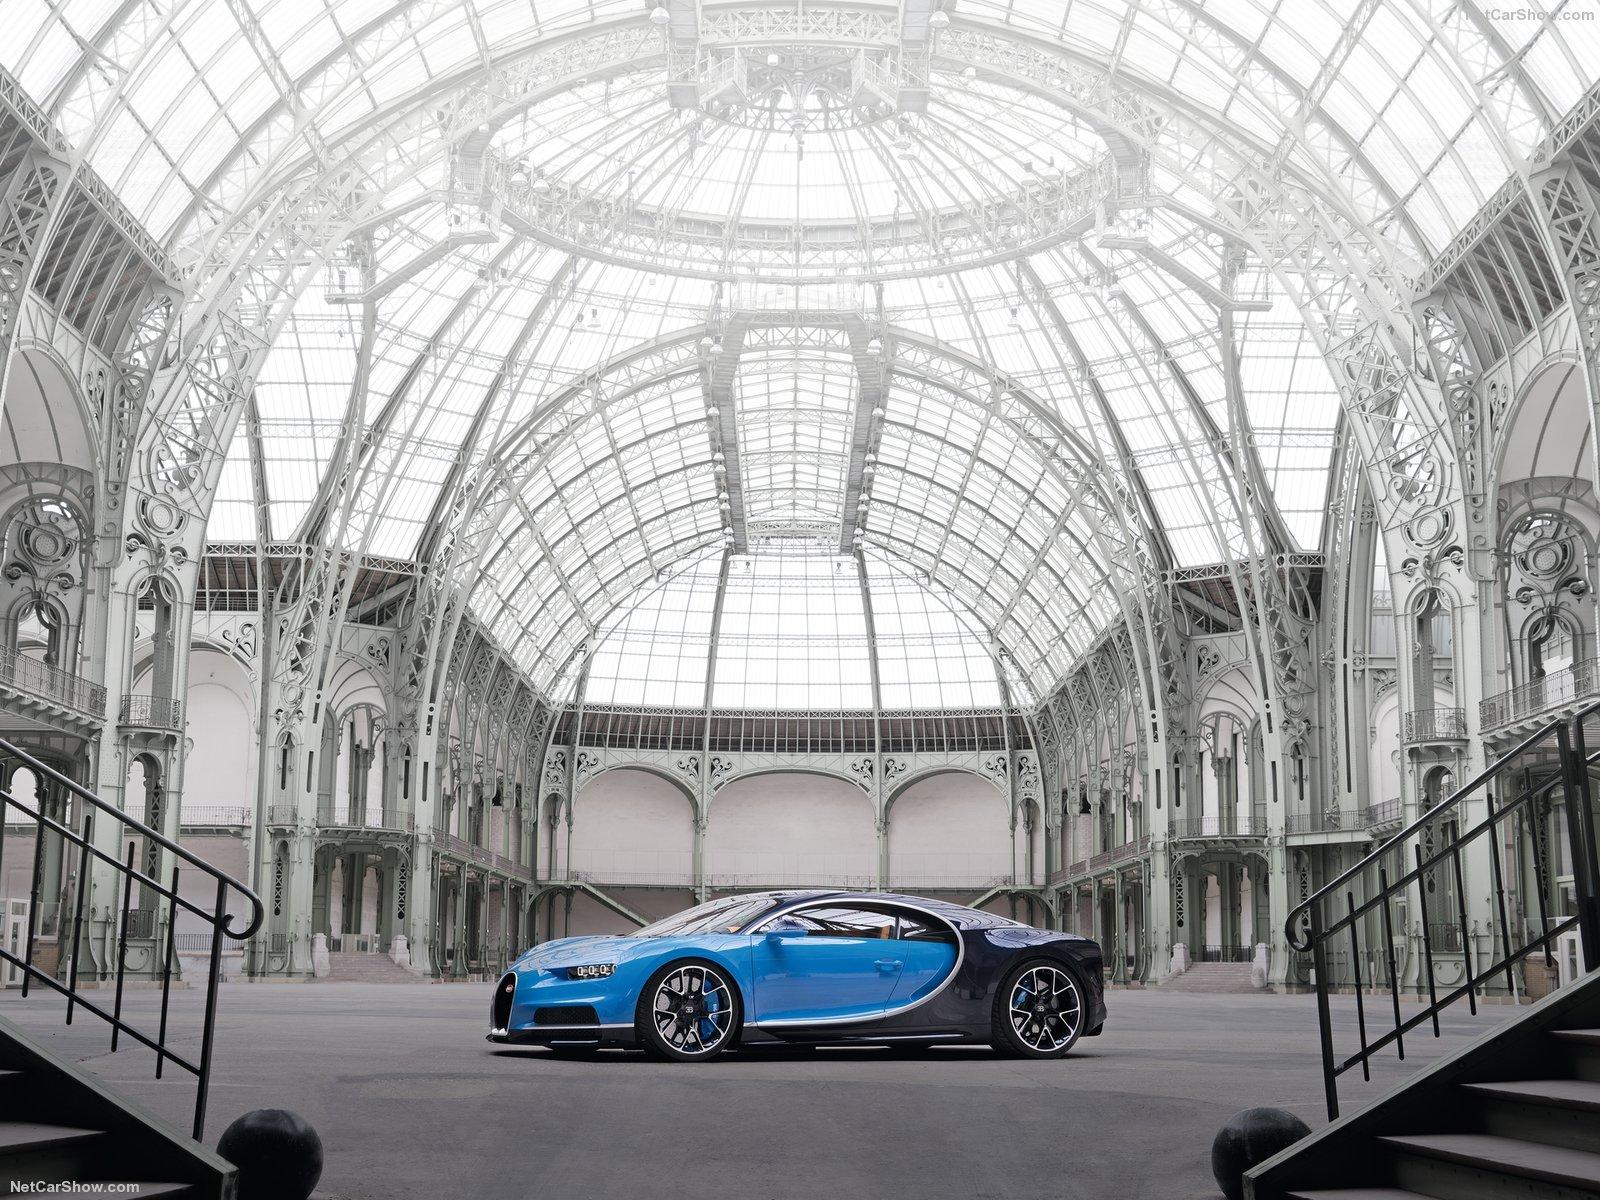 Bugatti-Chiron_2017_1600x1200_wallpaper_0a